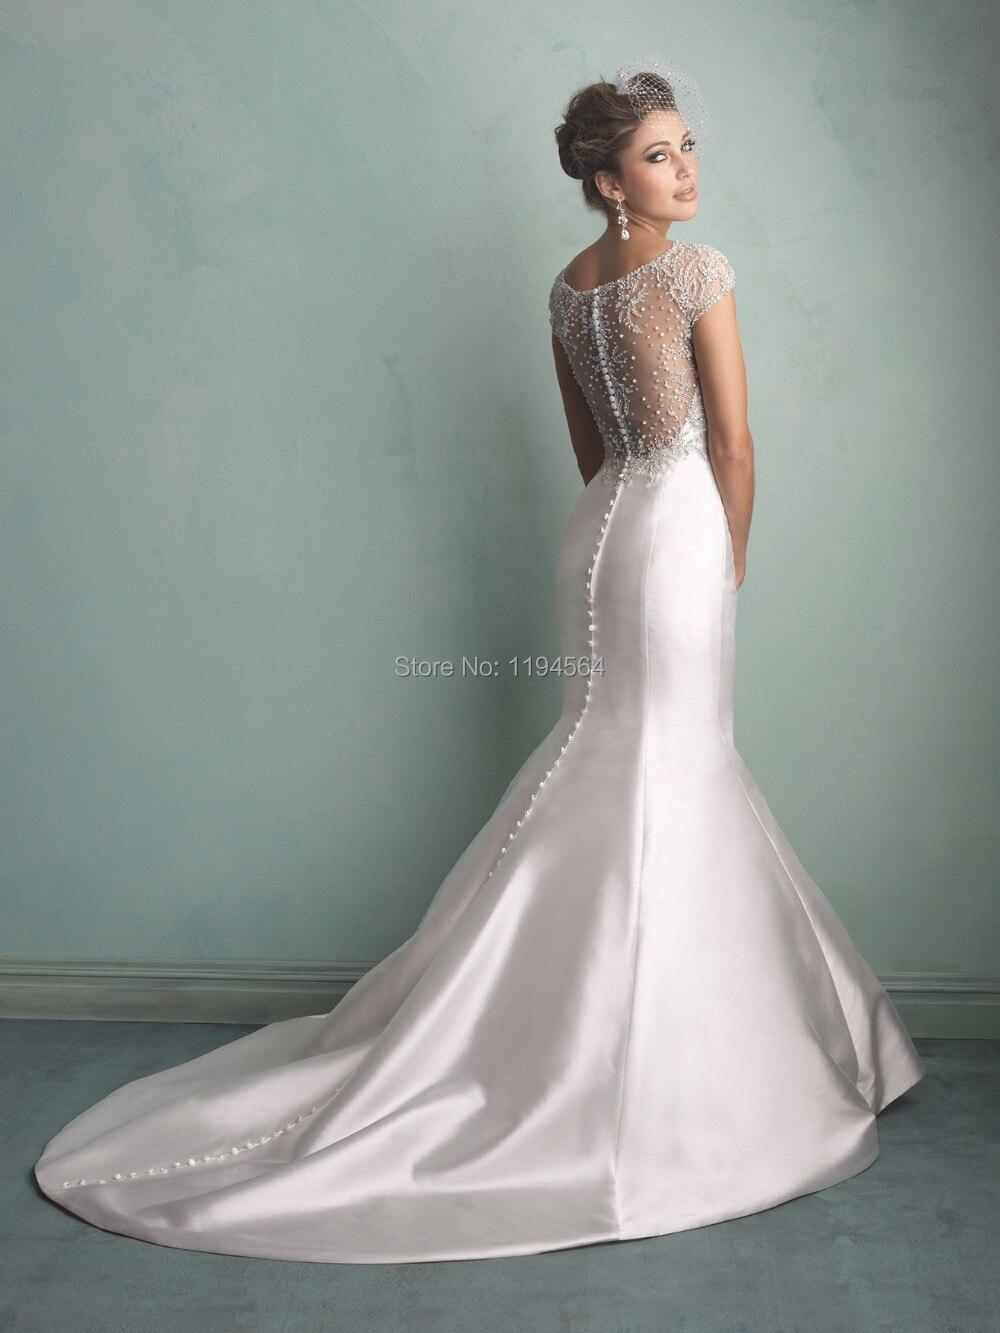 2014 Illusion Back Mermaid Wedding Dresses 2014 Beading Bridal Gowns ...